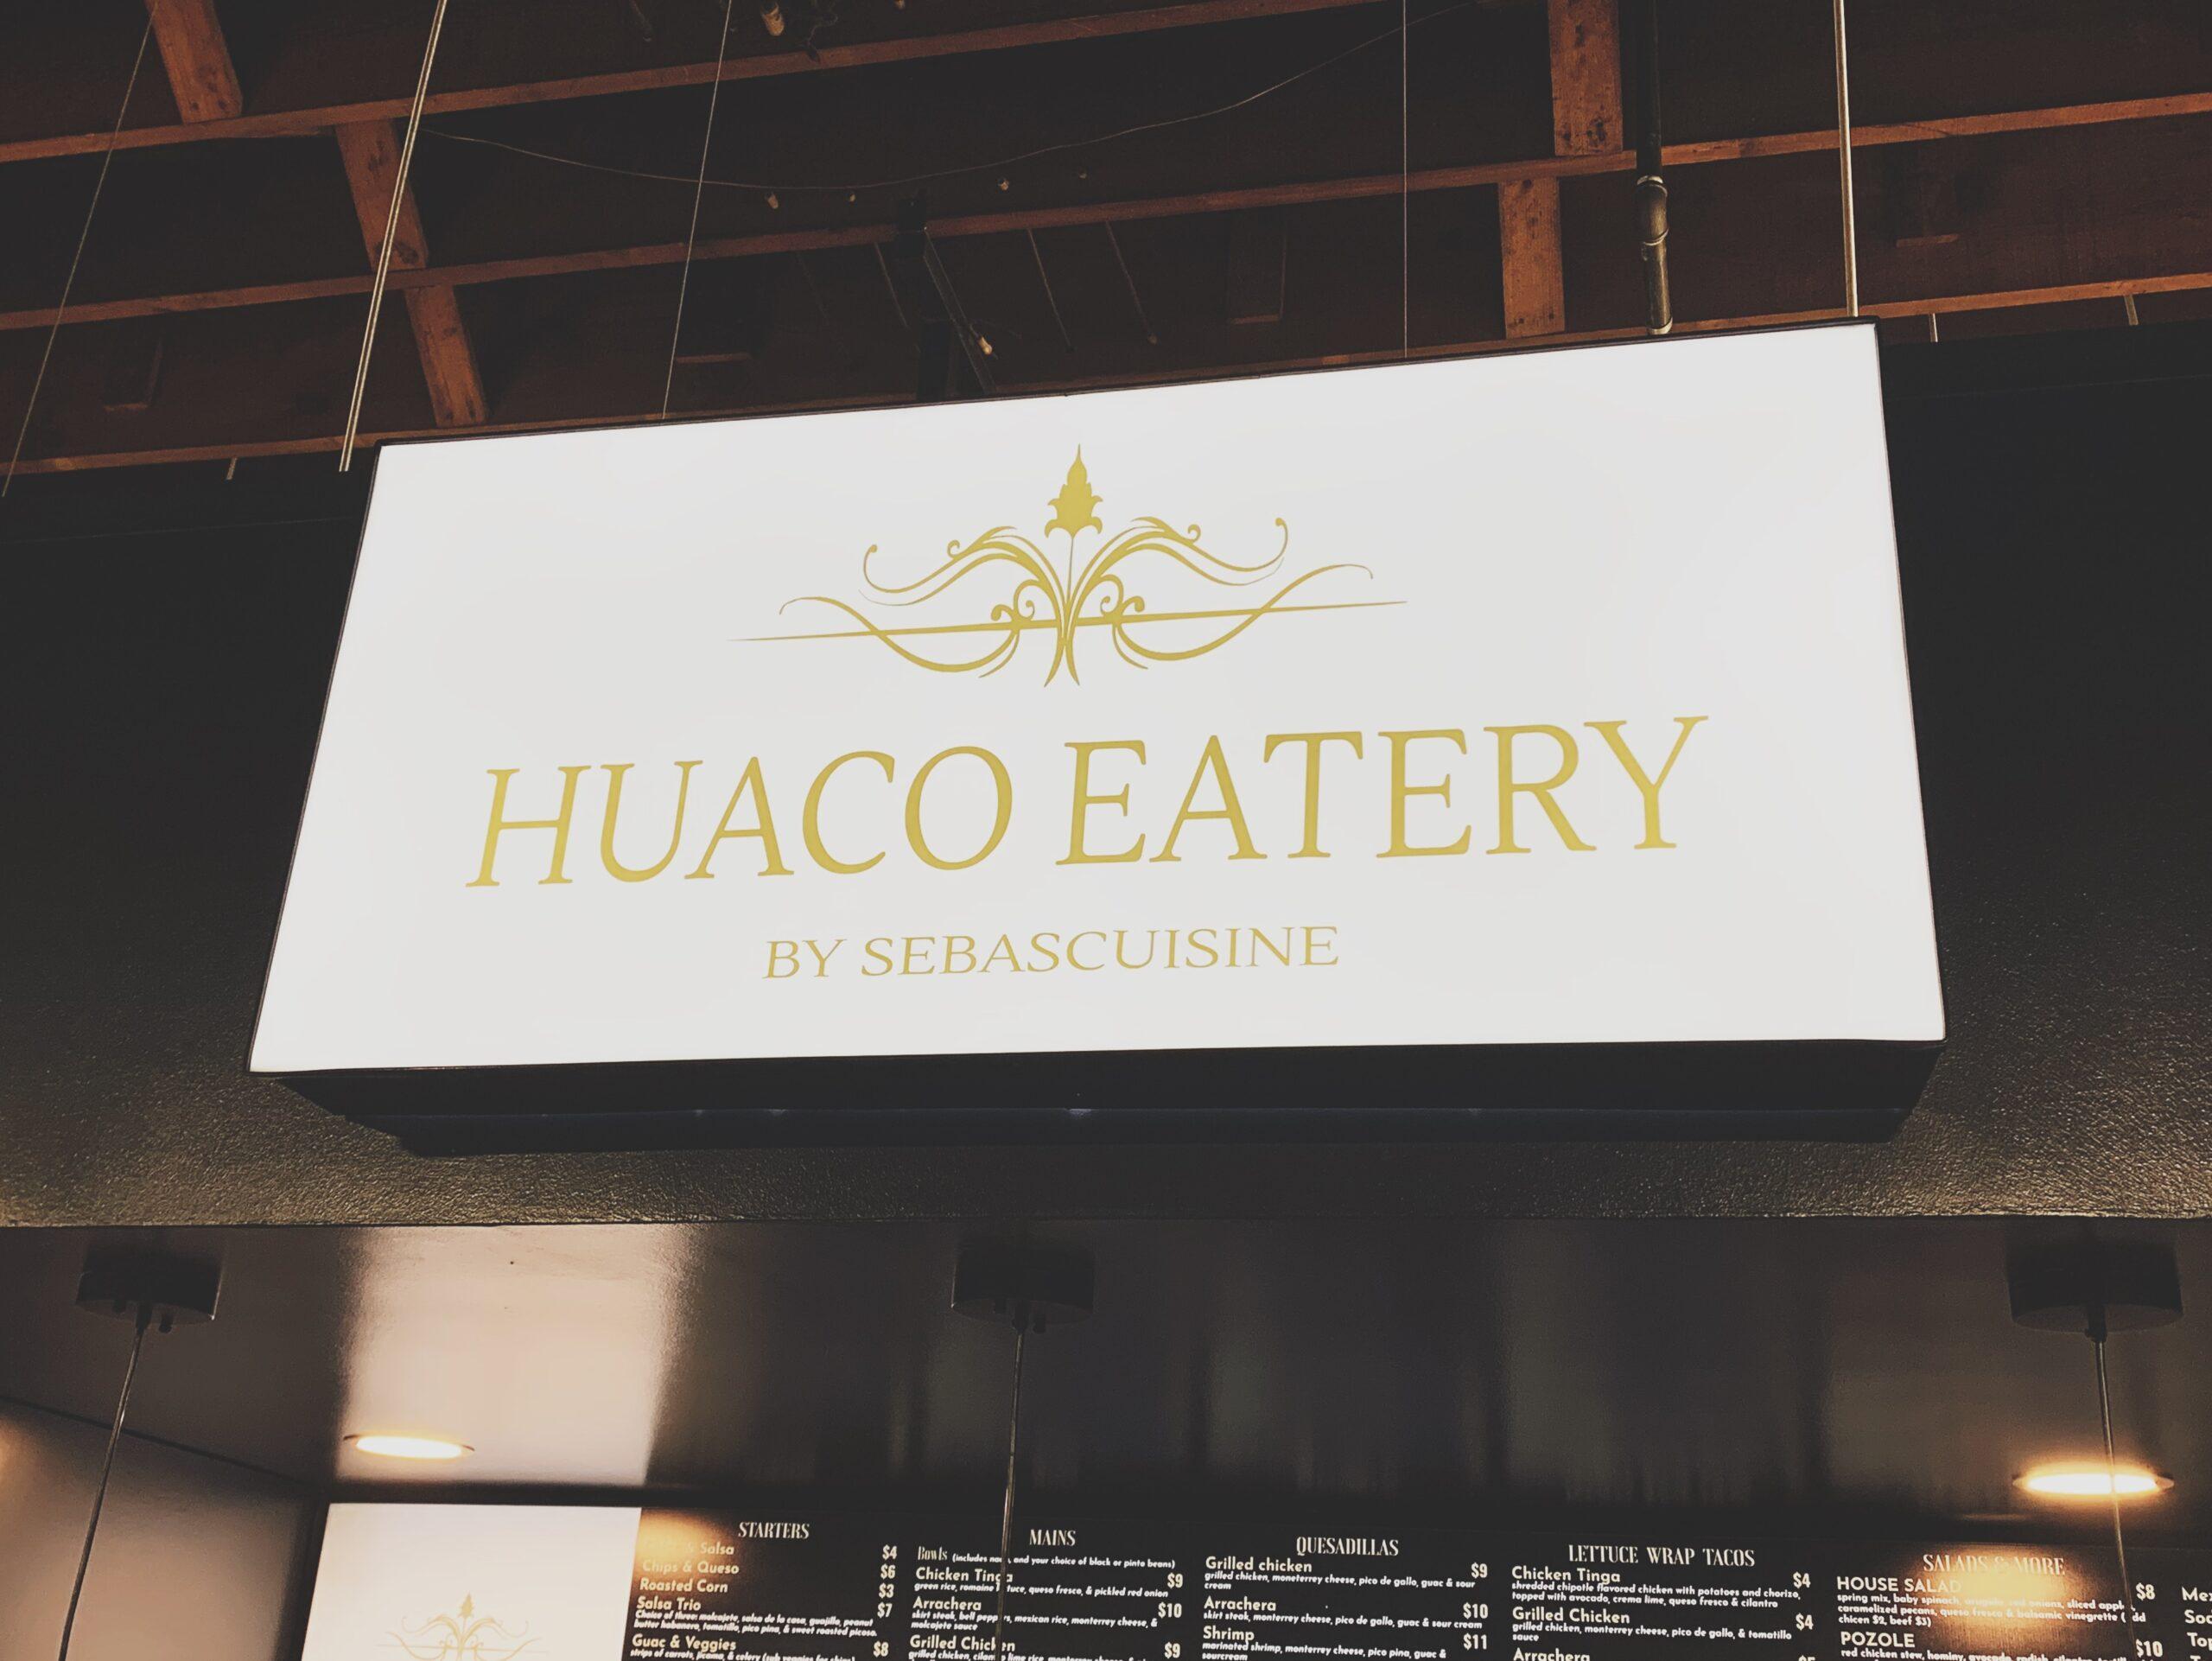 Huaco Eatery - Union Hall